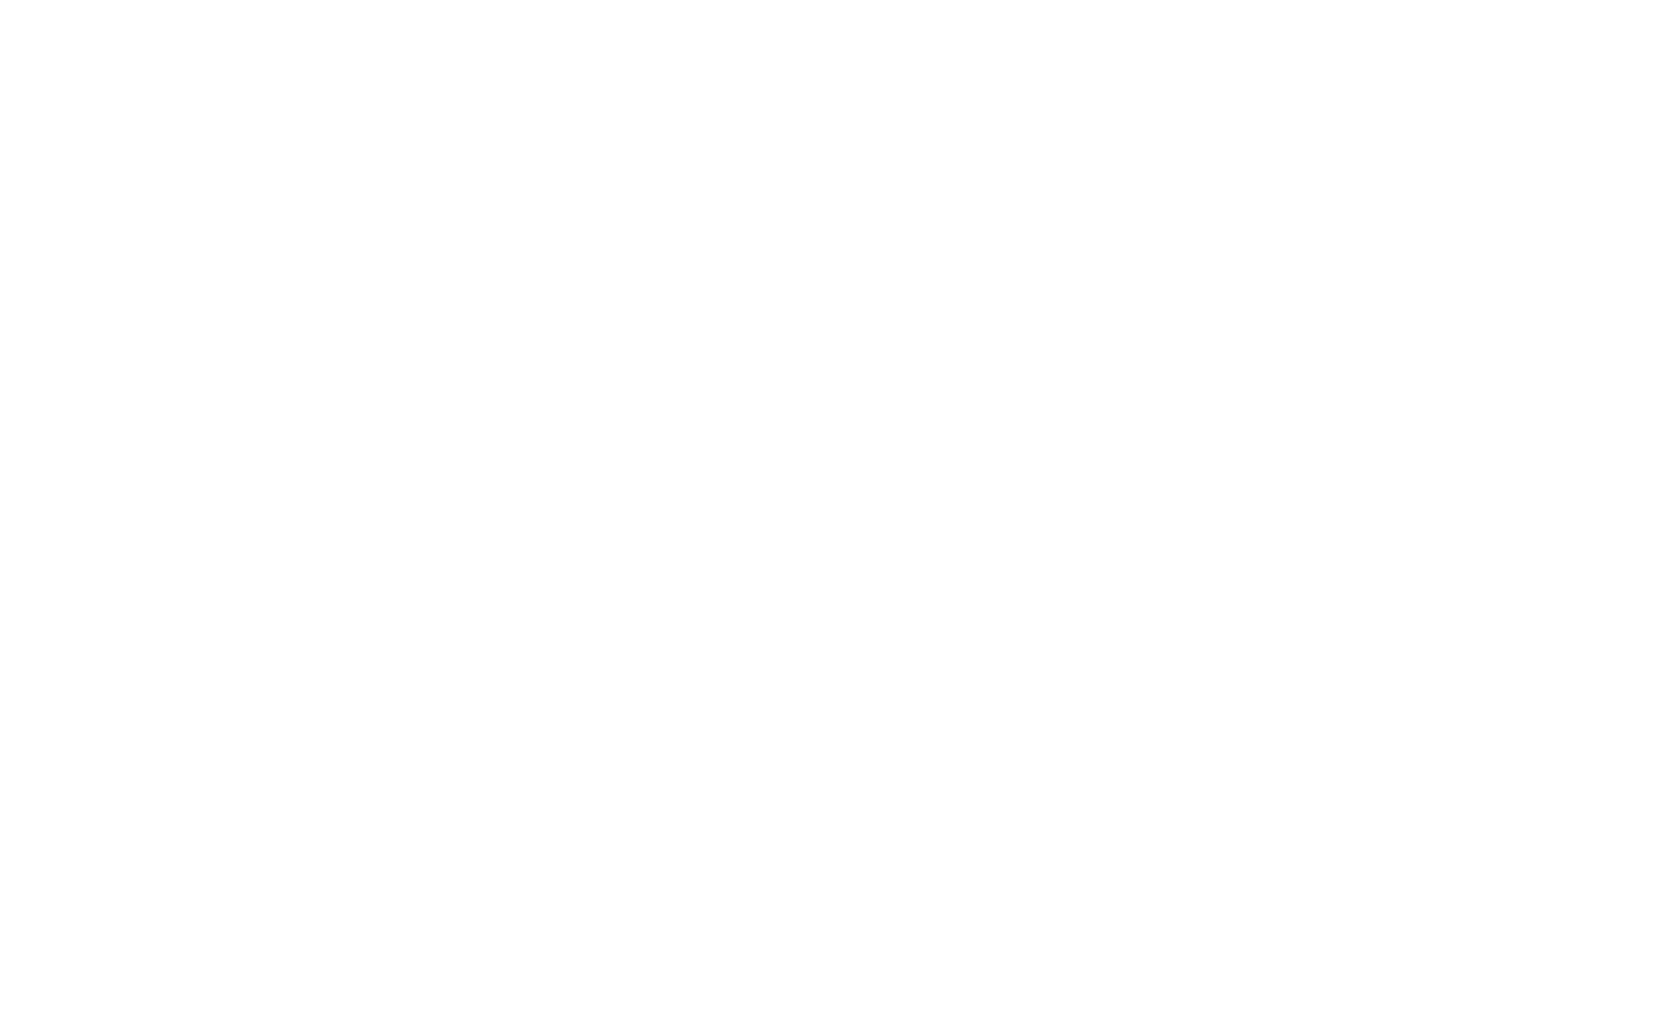 Web Design & Development - SoulForceOne Digital Marketing